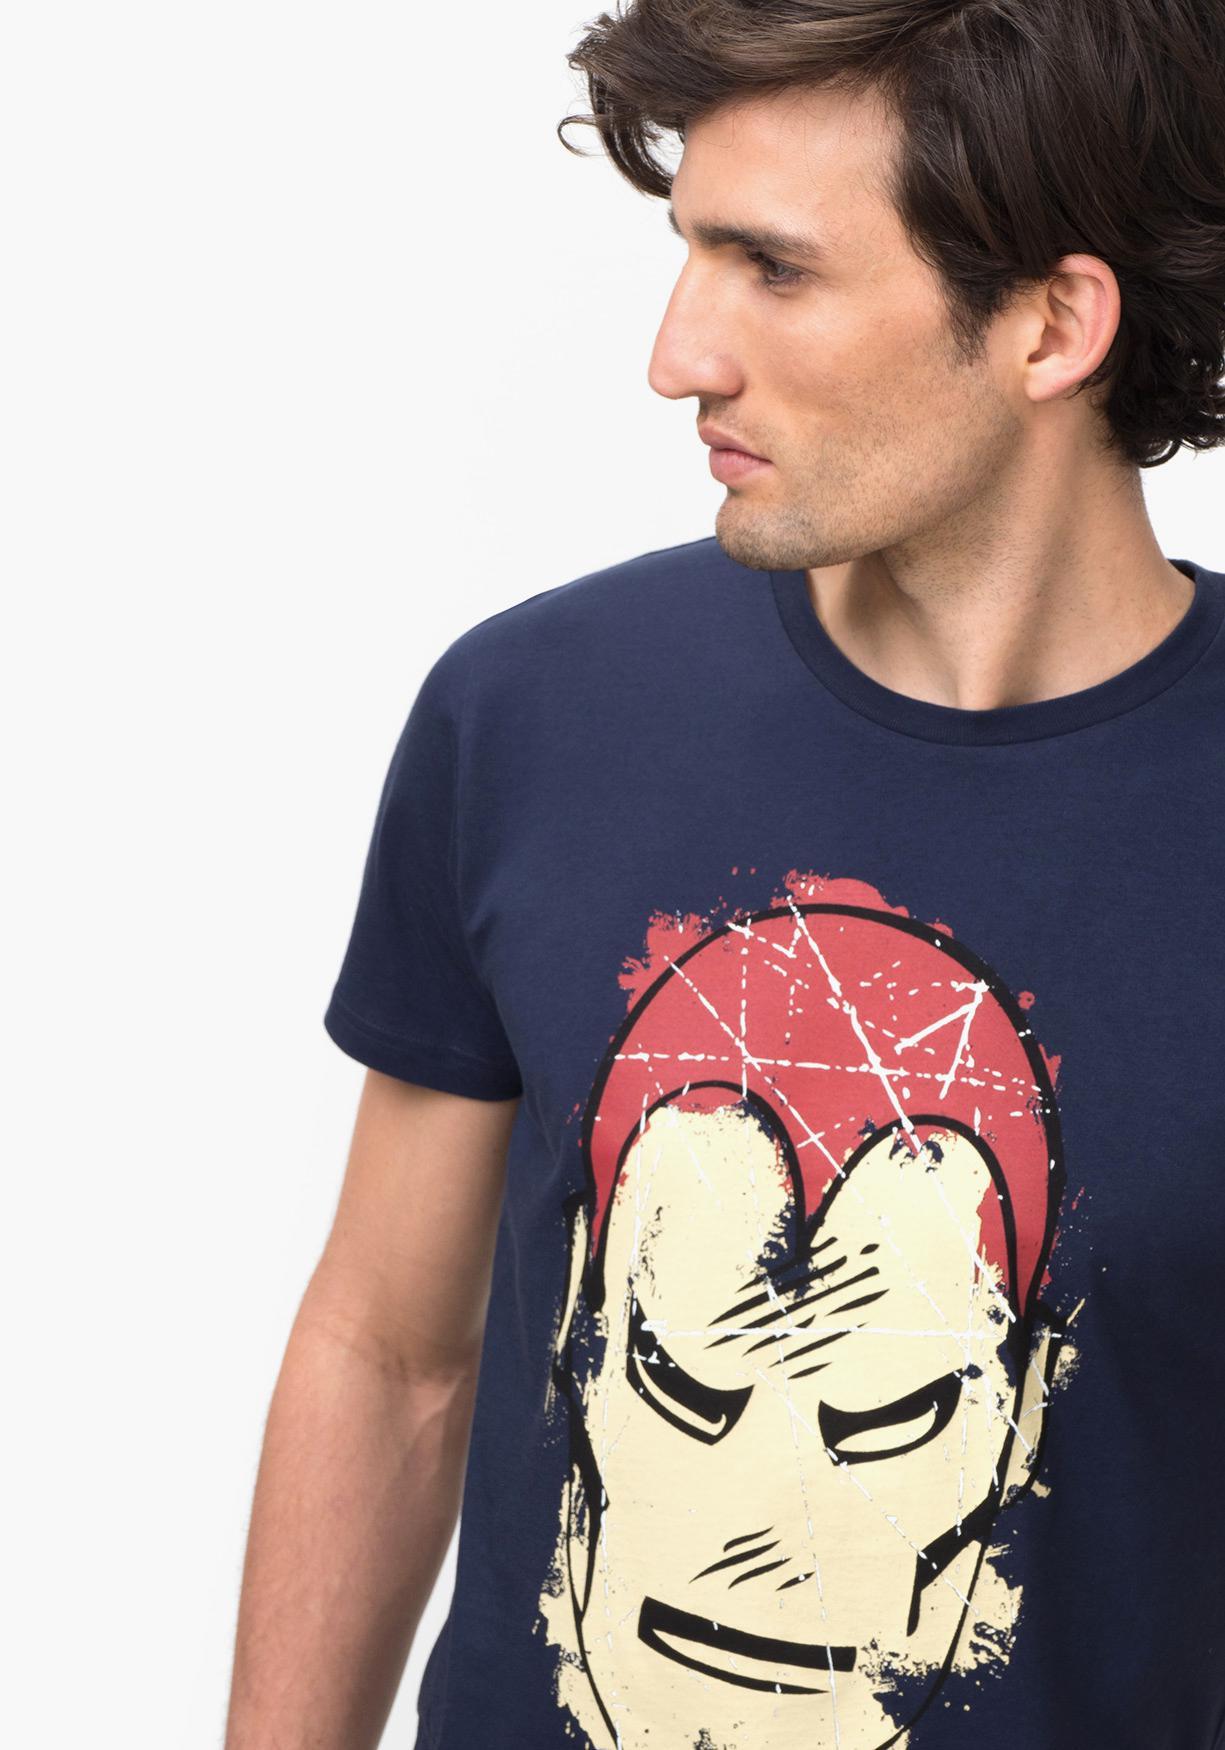 Nuestros Camiseta Corta De Manga Comprar Marvel¡aprovéchate SqMVUzp